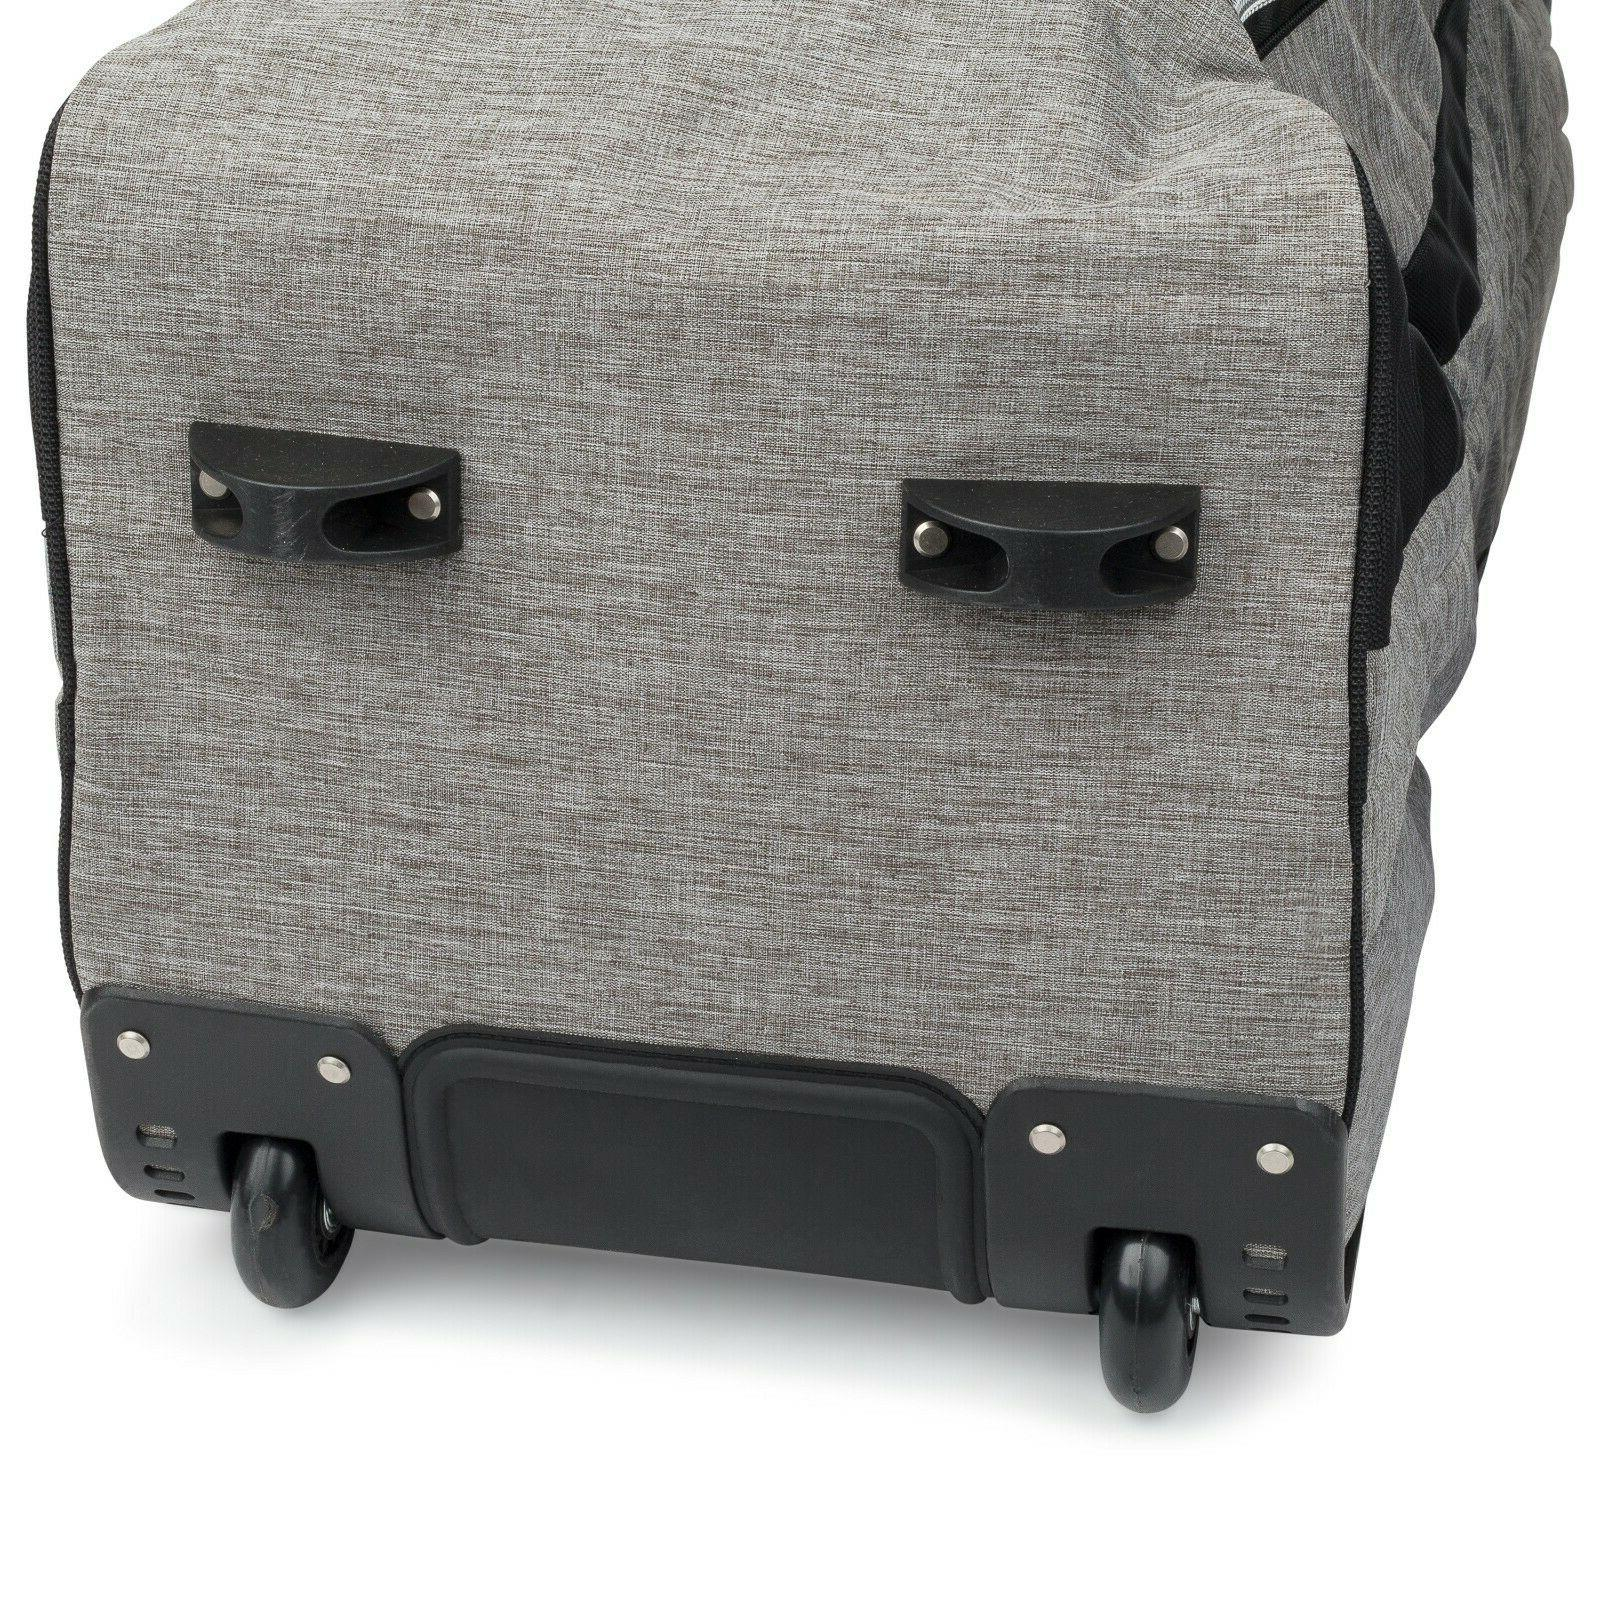 Founders Travel Bag Padded